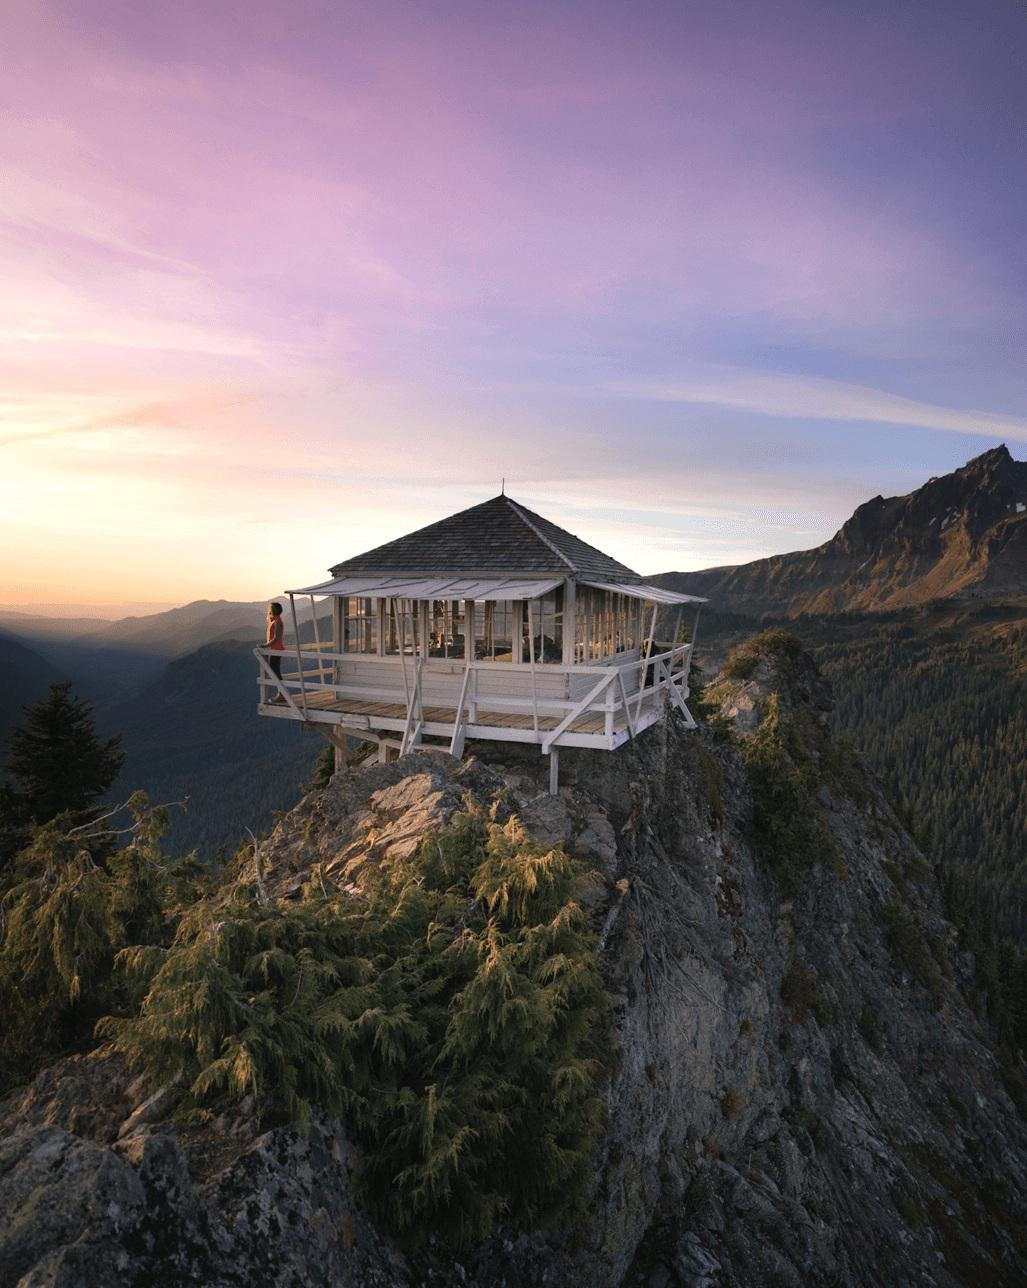 Park Butte Lookout in the Mount Baker Wilderness.